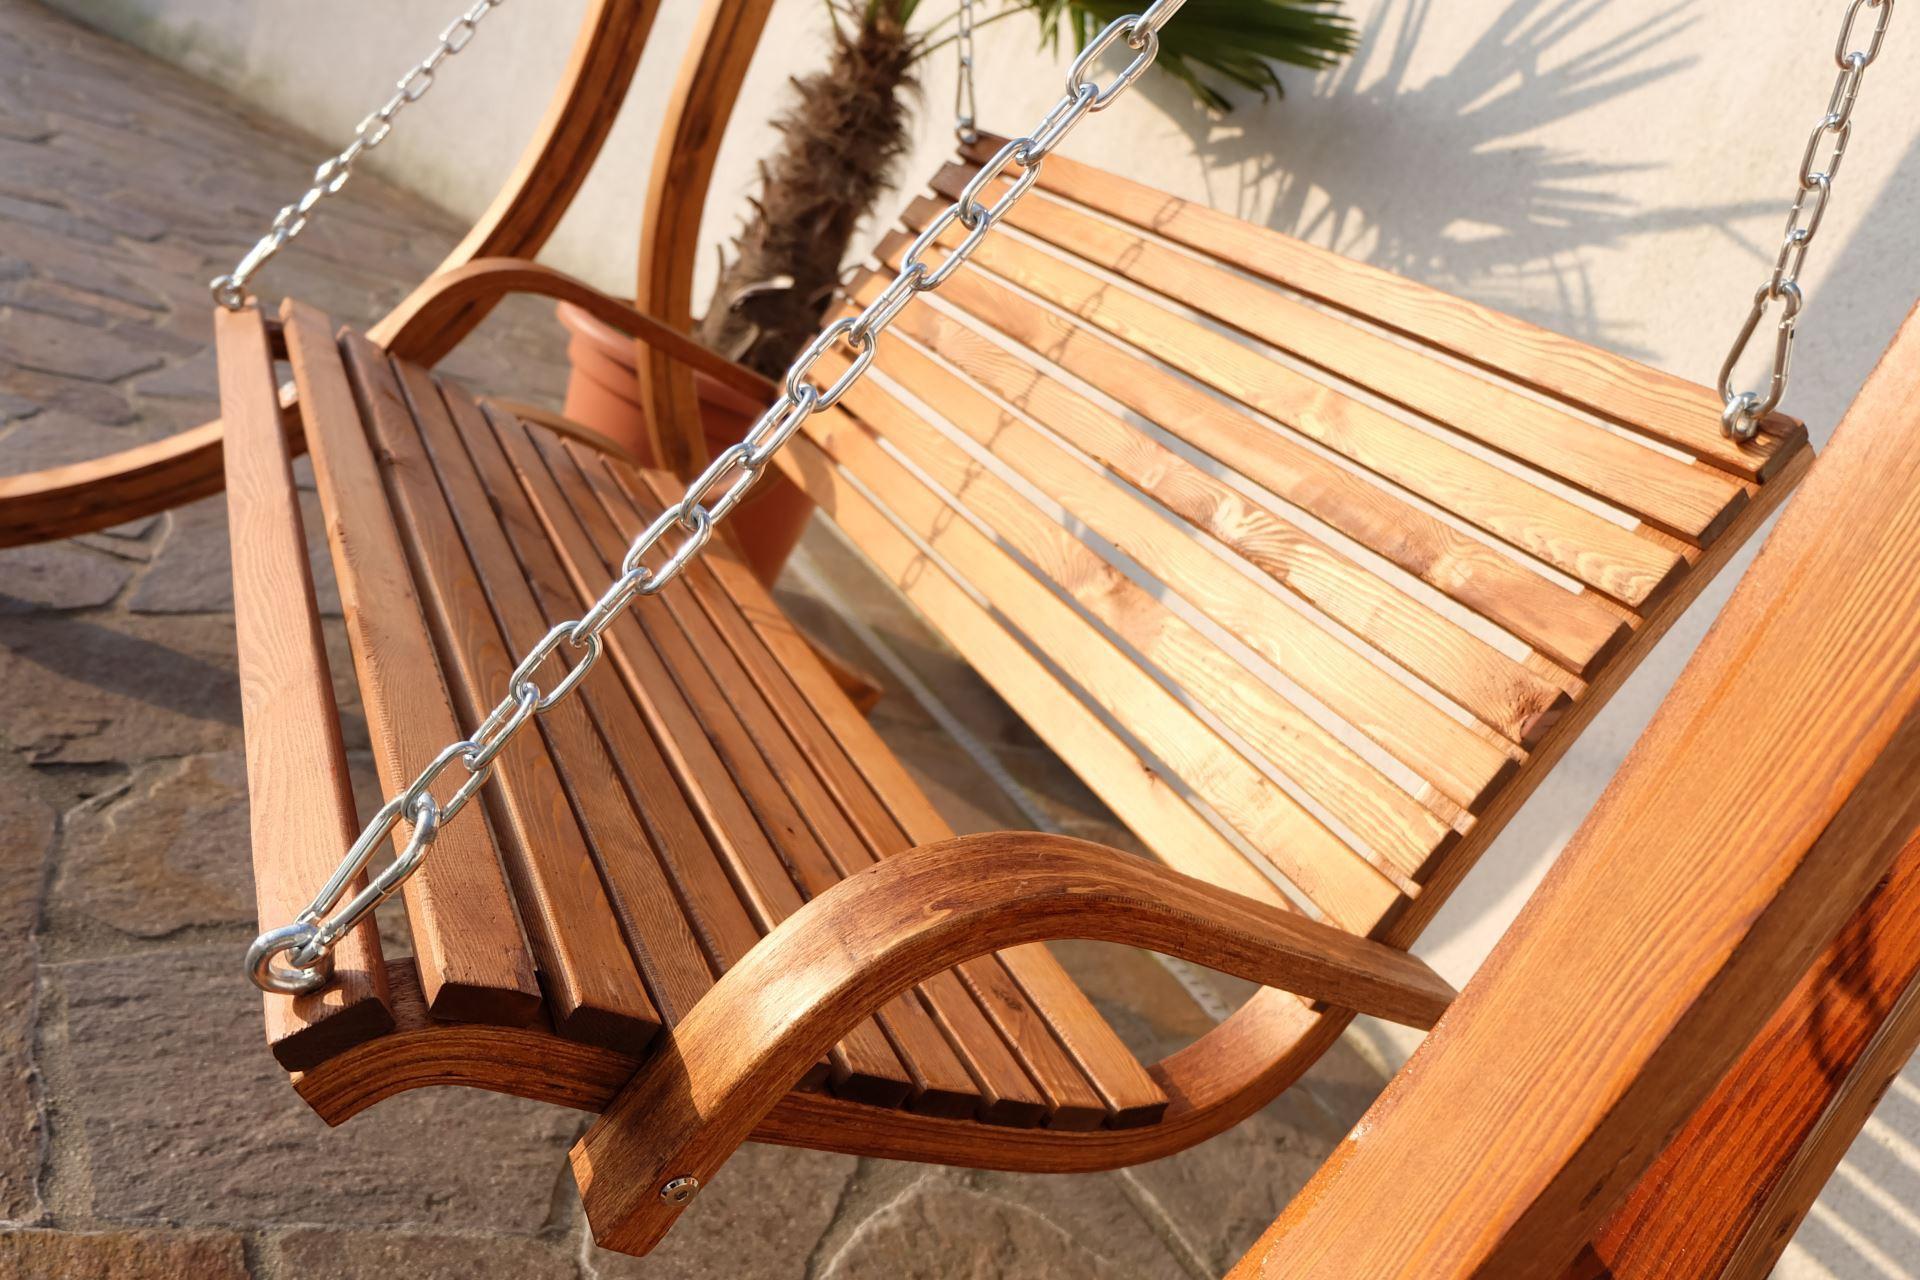 Design Hollywoodschaukel Gartenschaukel Hollywood Schaukel ...  Design Hollywoo...